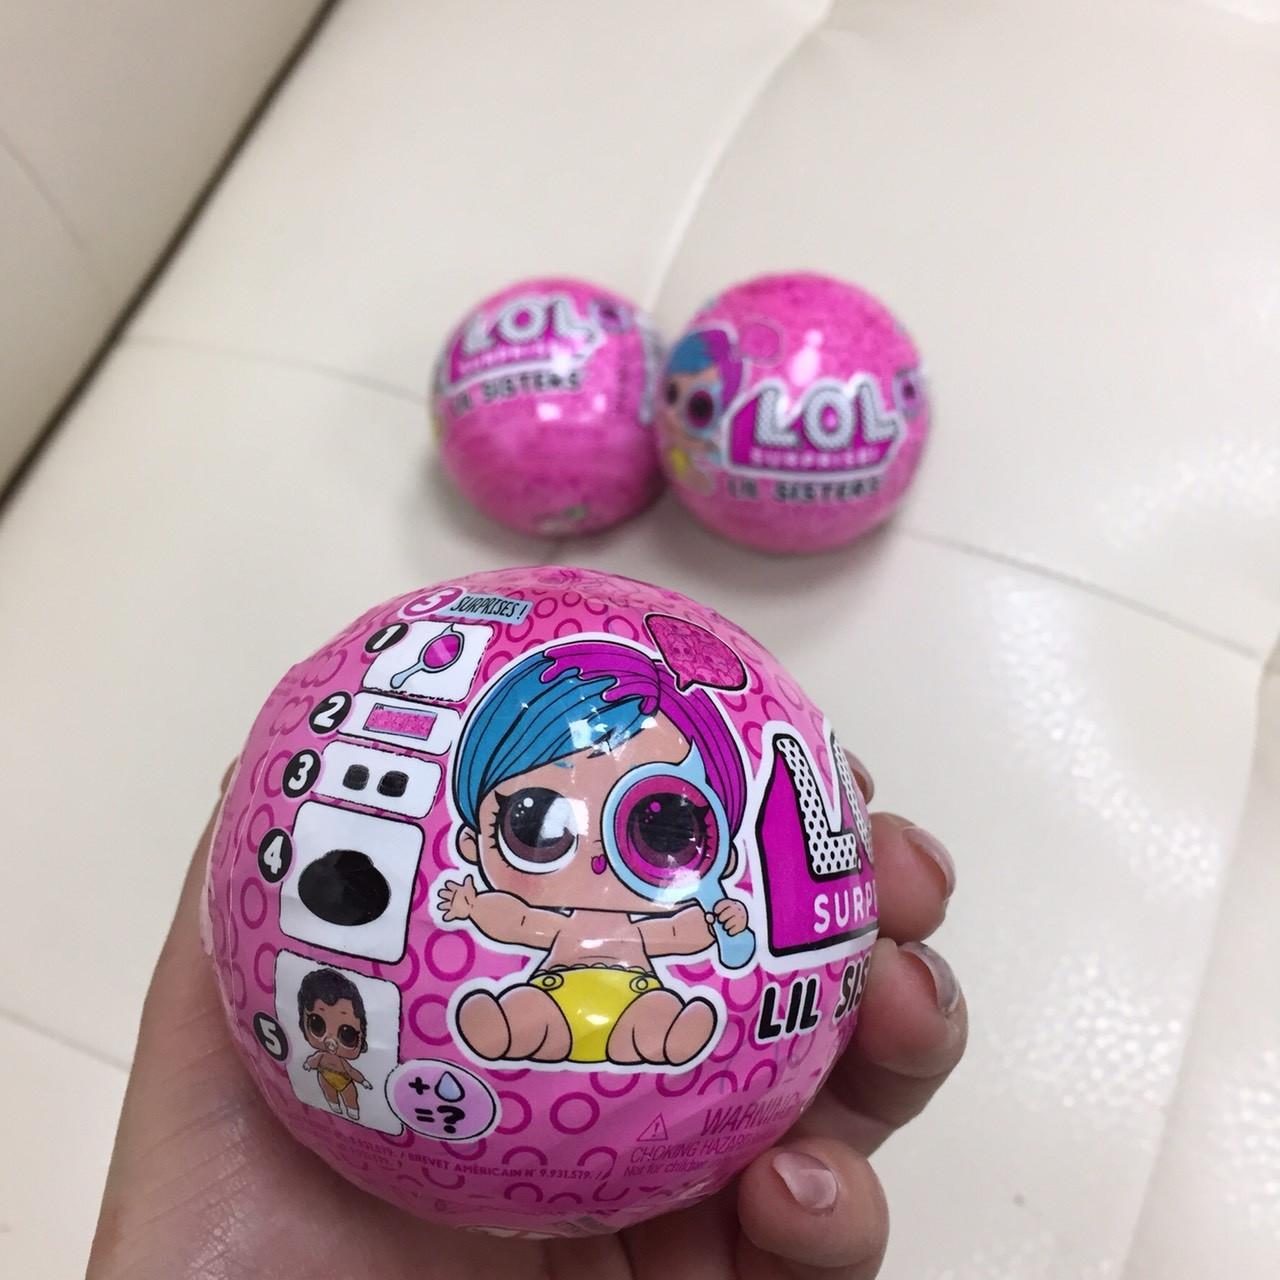 LOL Surprise Lil sisters игрушка шар ЛОЛ Сюрприз Сестрички Оригинал